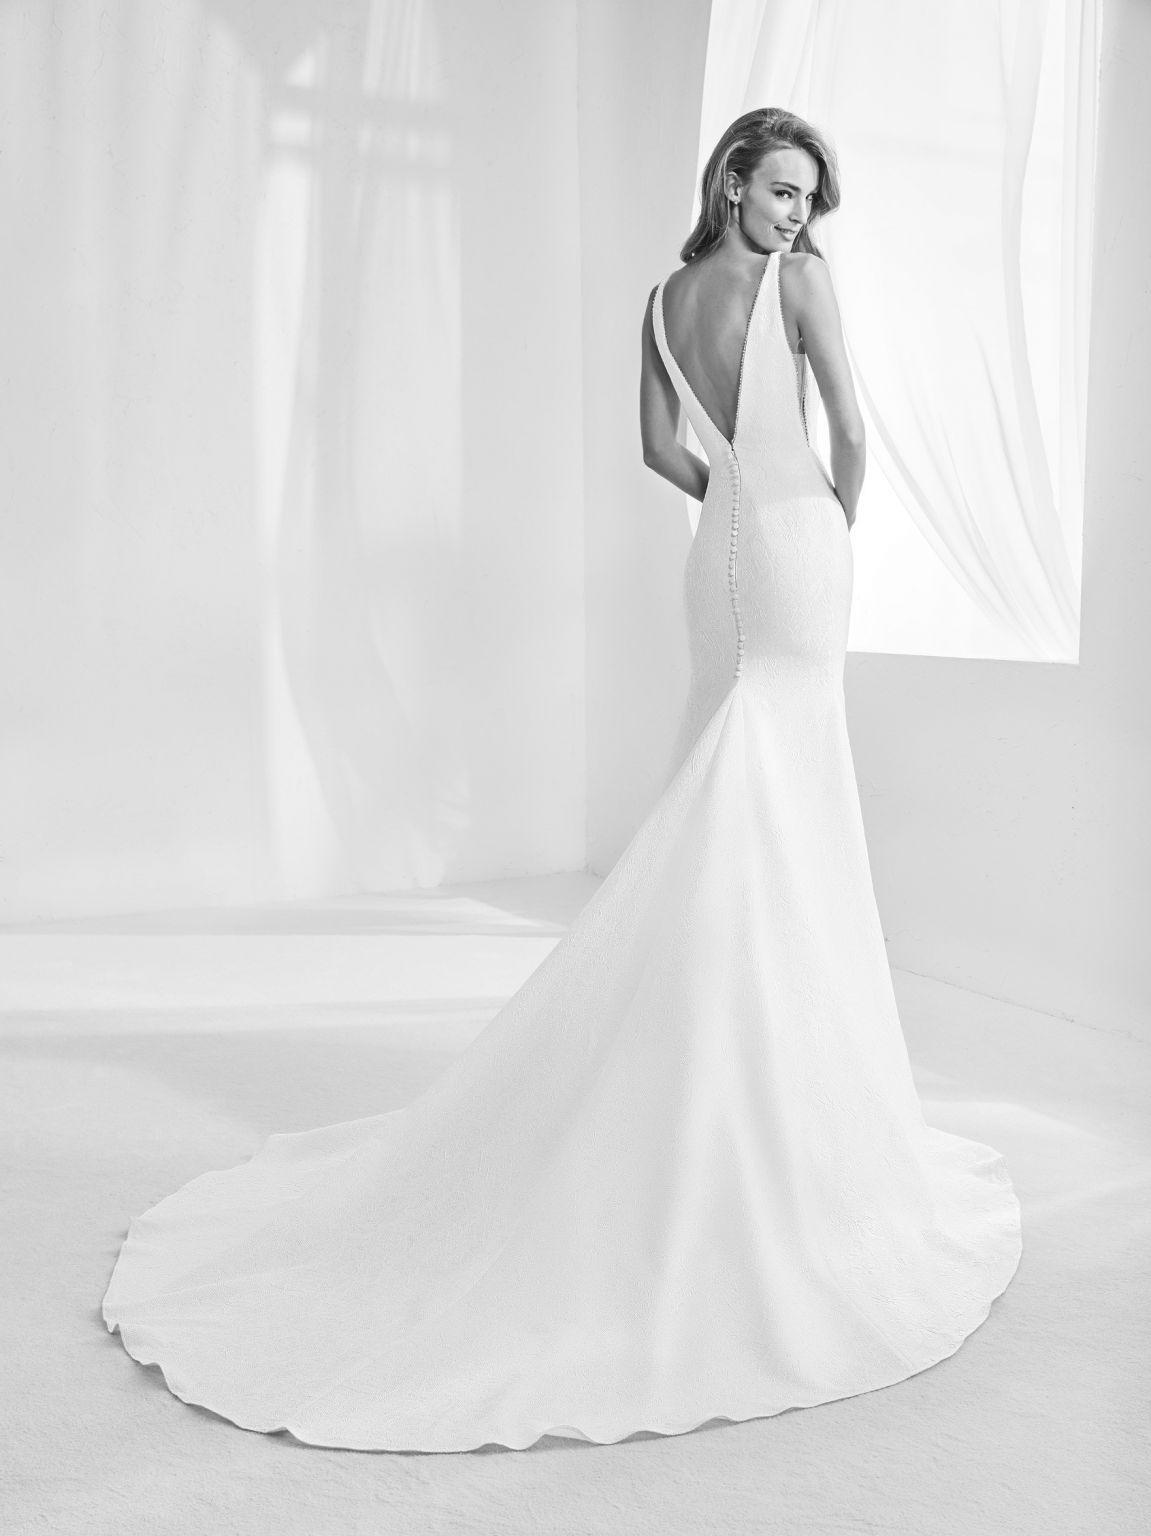 Pronovias Racimo 6 Pronovias Wedding Dress Provonias Wedding Dress Wedding Dresses